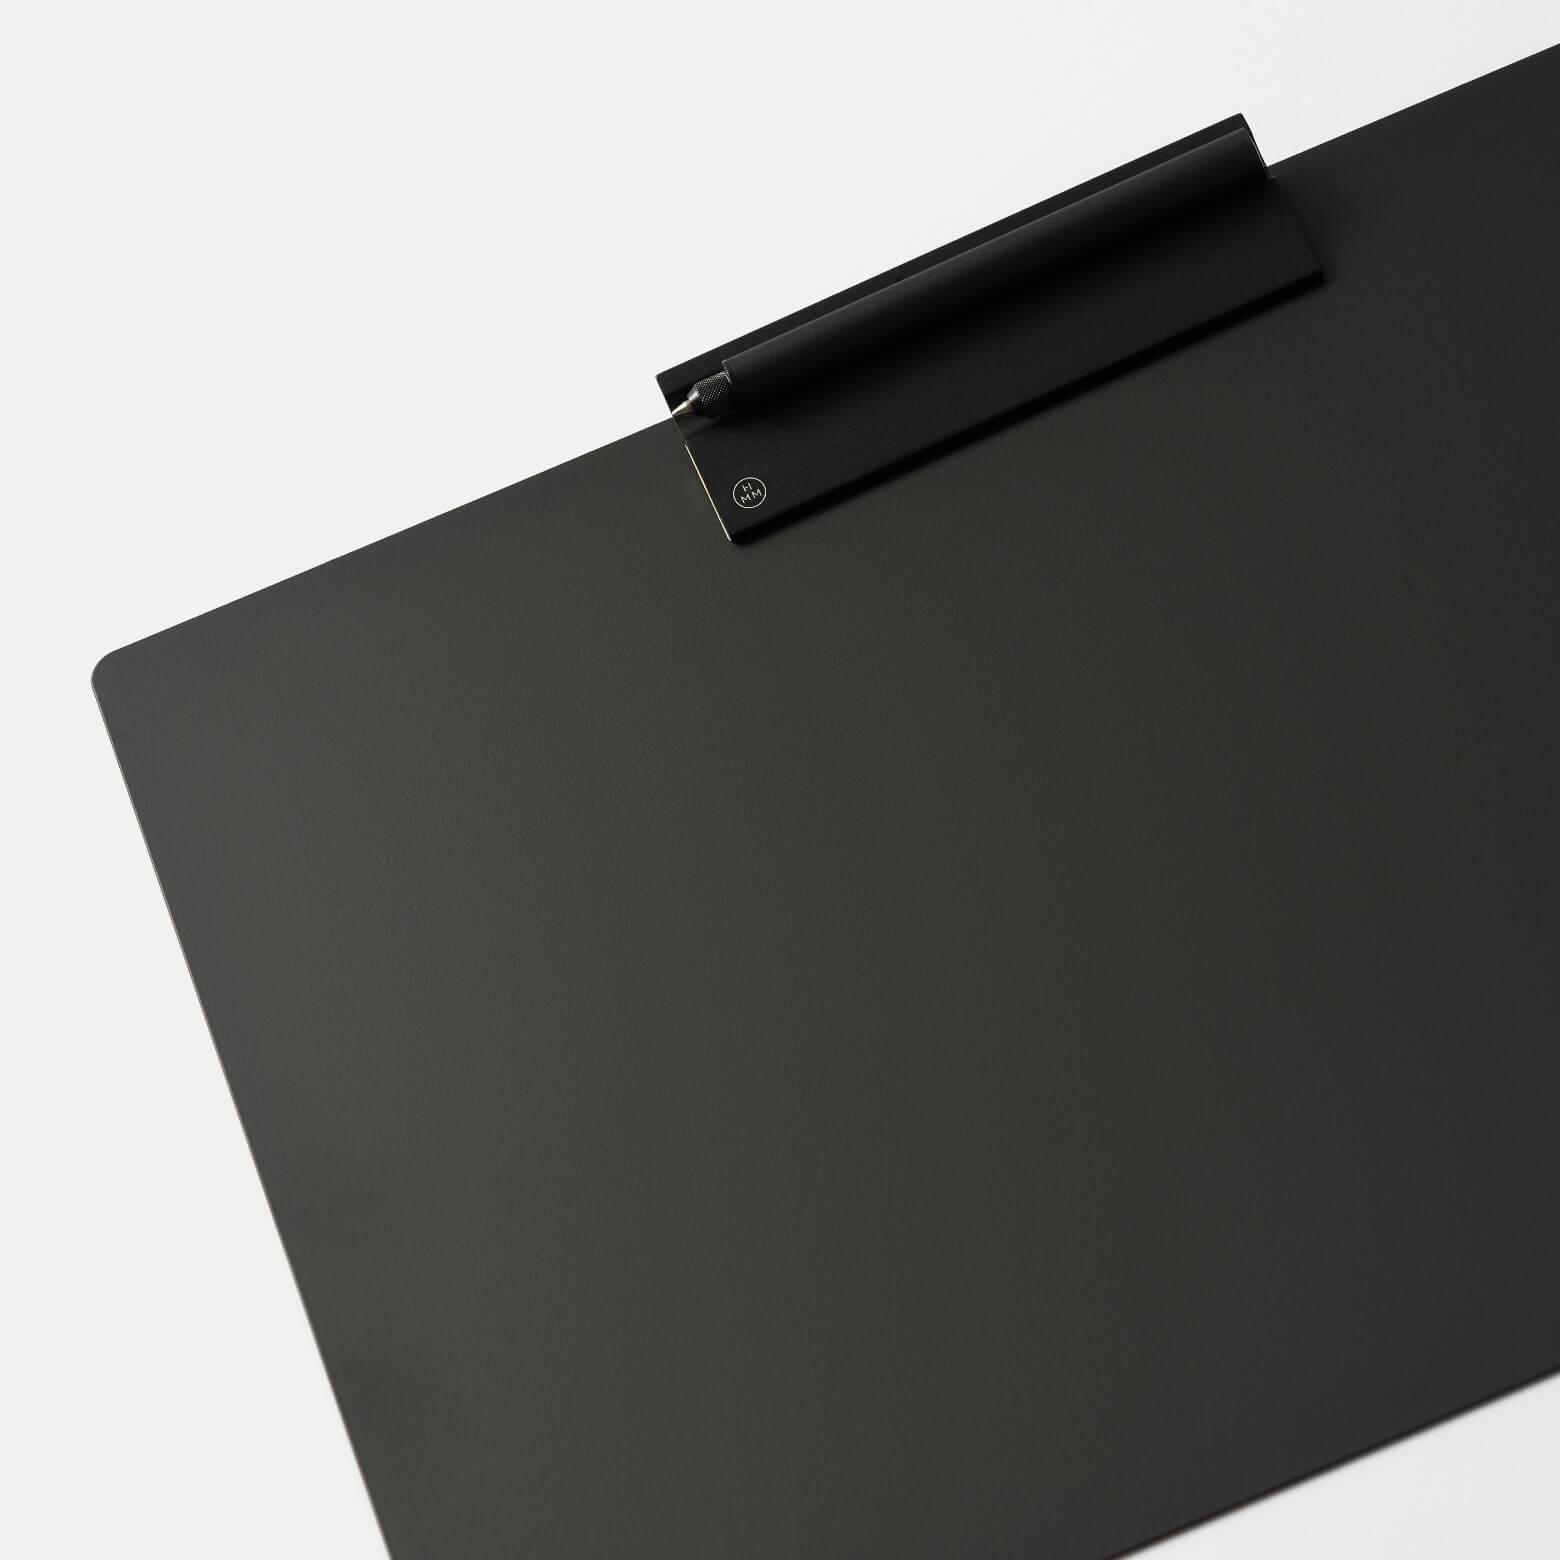 Clipboard — планшет A4 с ручкой